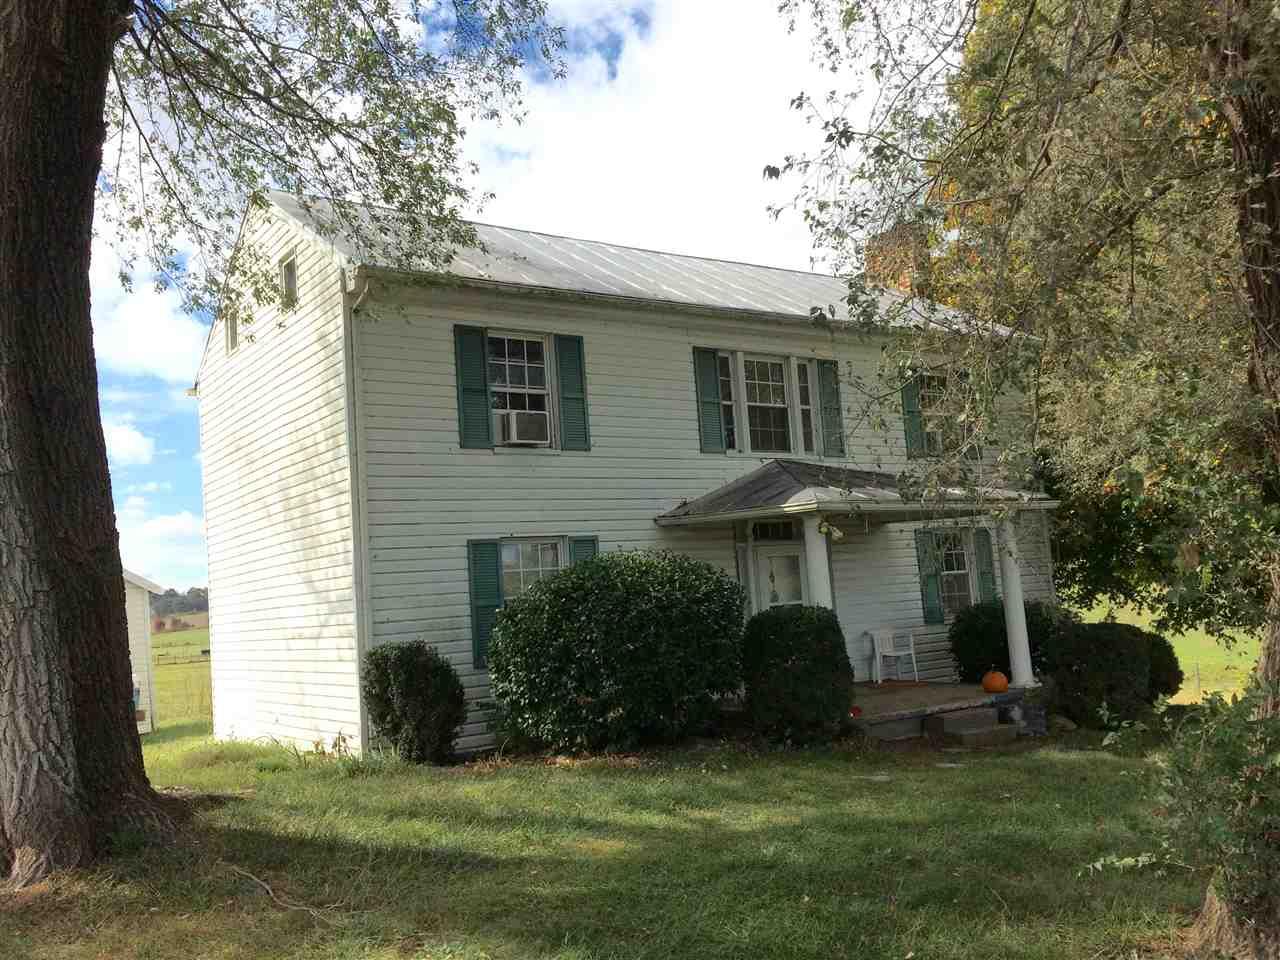 1195-A KIDDSVILLE RD, WAYNESBORO, VA 22980